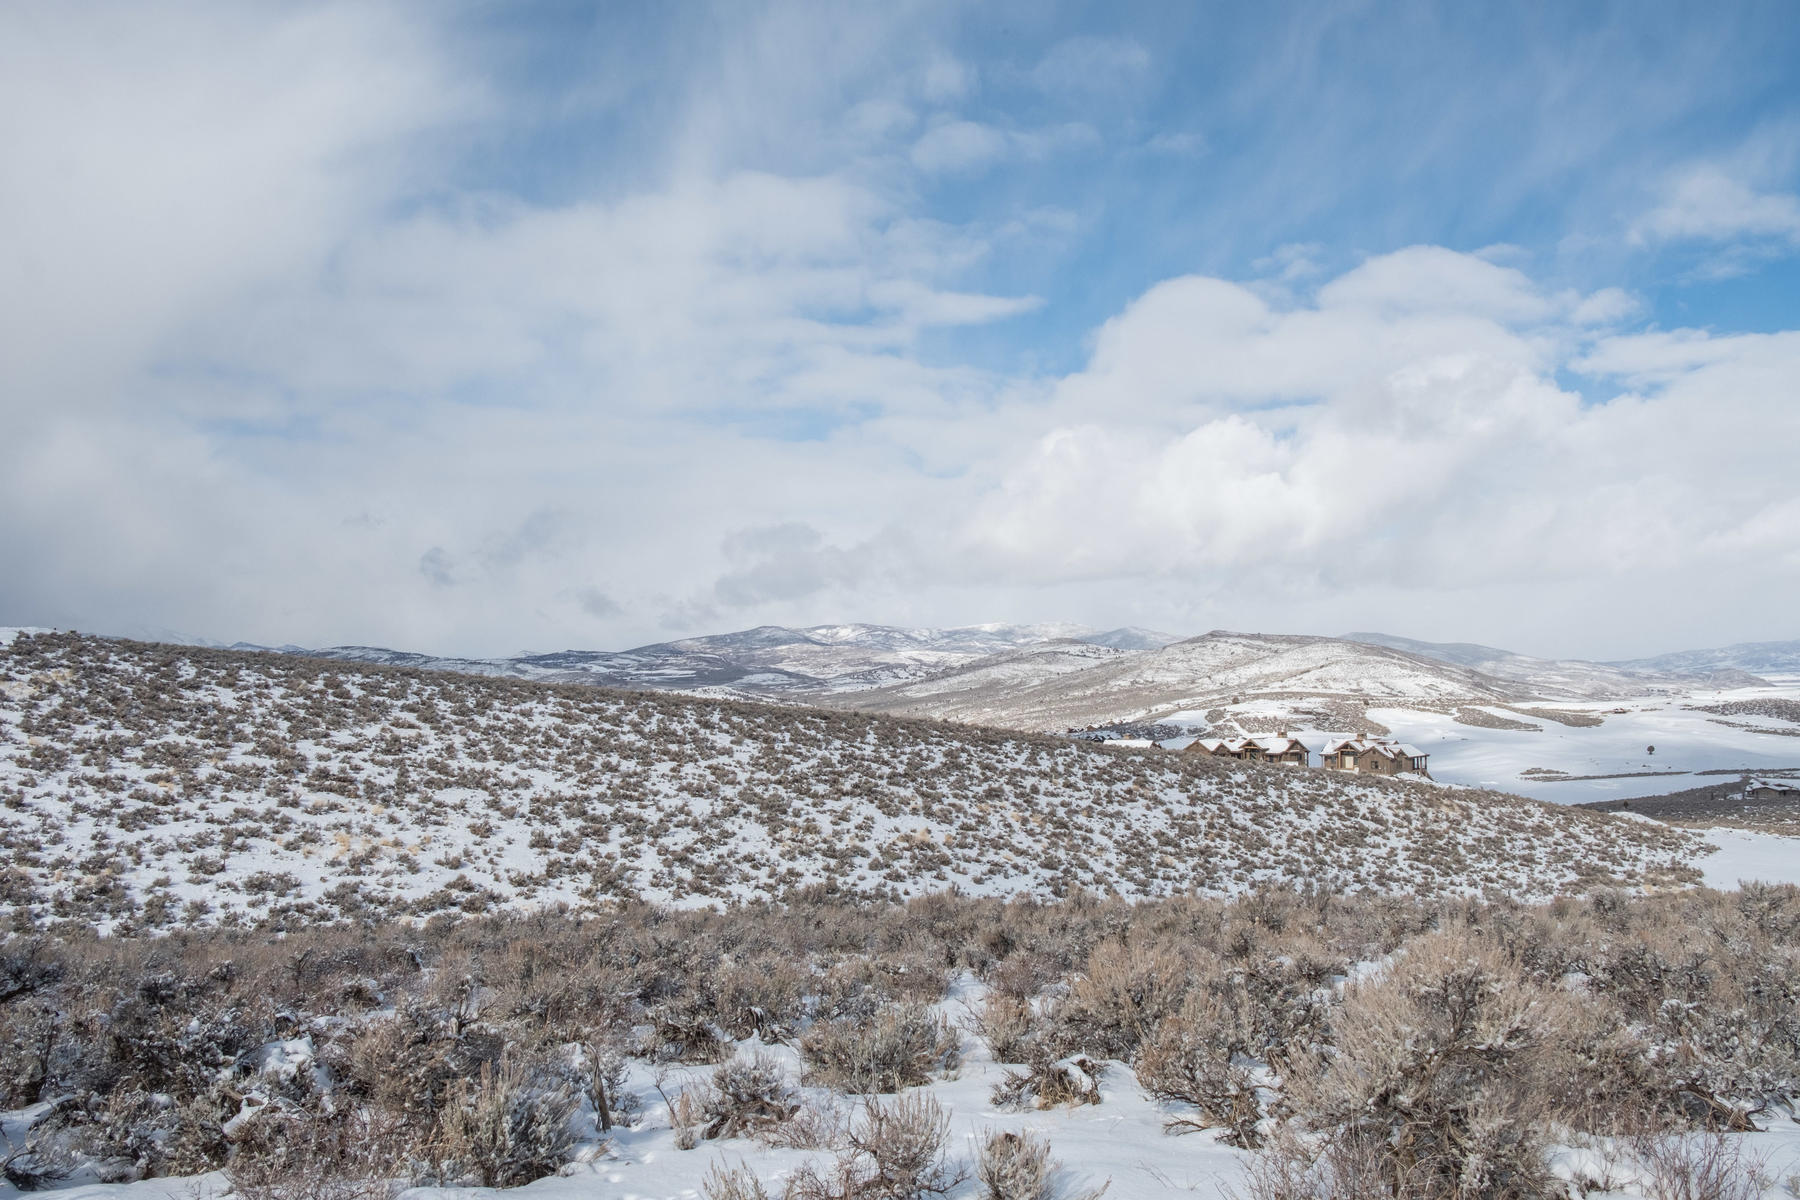 Terreno per Vendita alle ore Gorgeous Panoramic Views at Victory Ranch! 7093 E Evening Star Dr Lot 219, Heber City, Utah, 84032 Stati Uniti